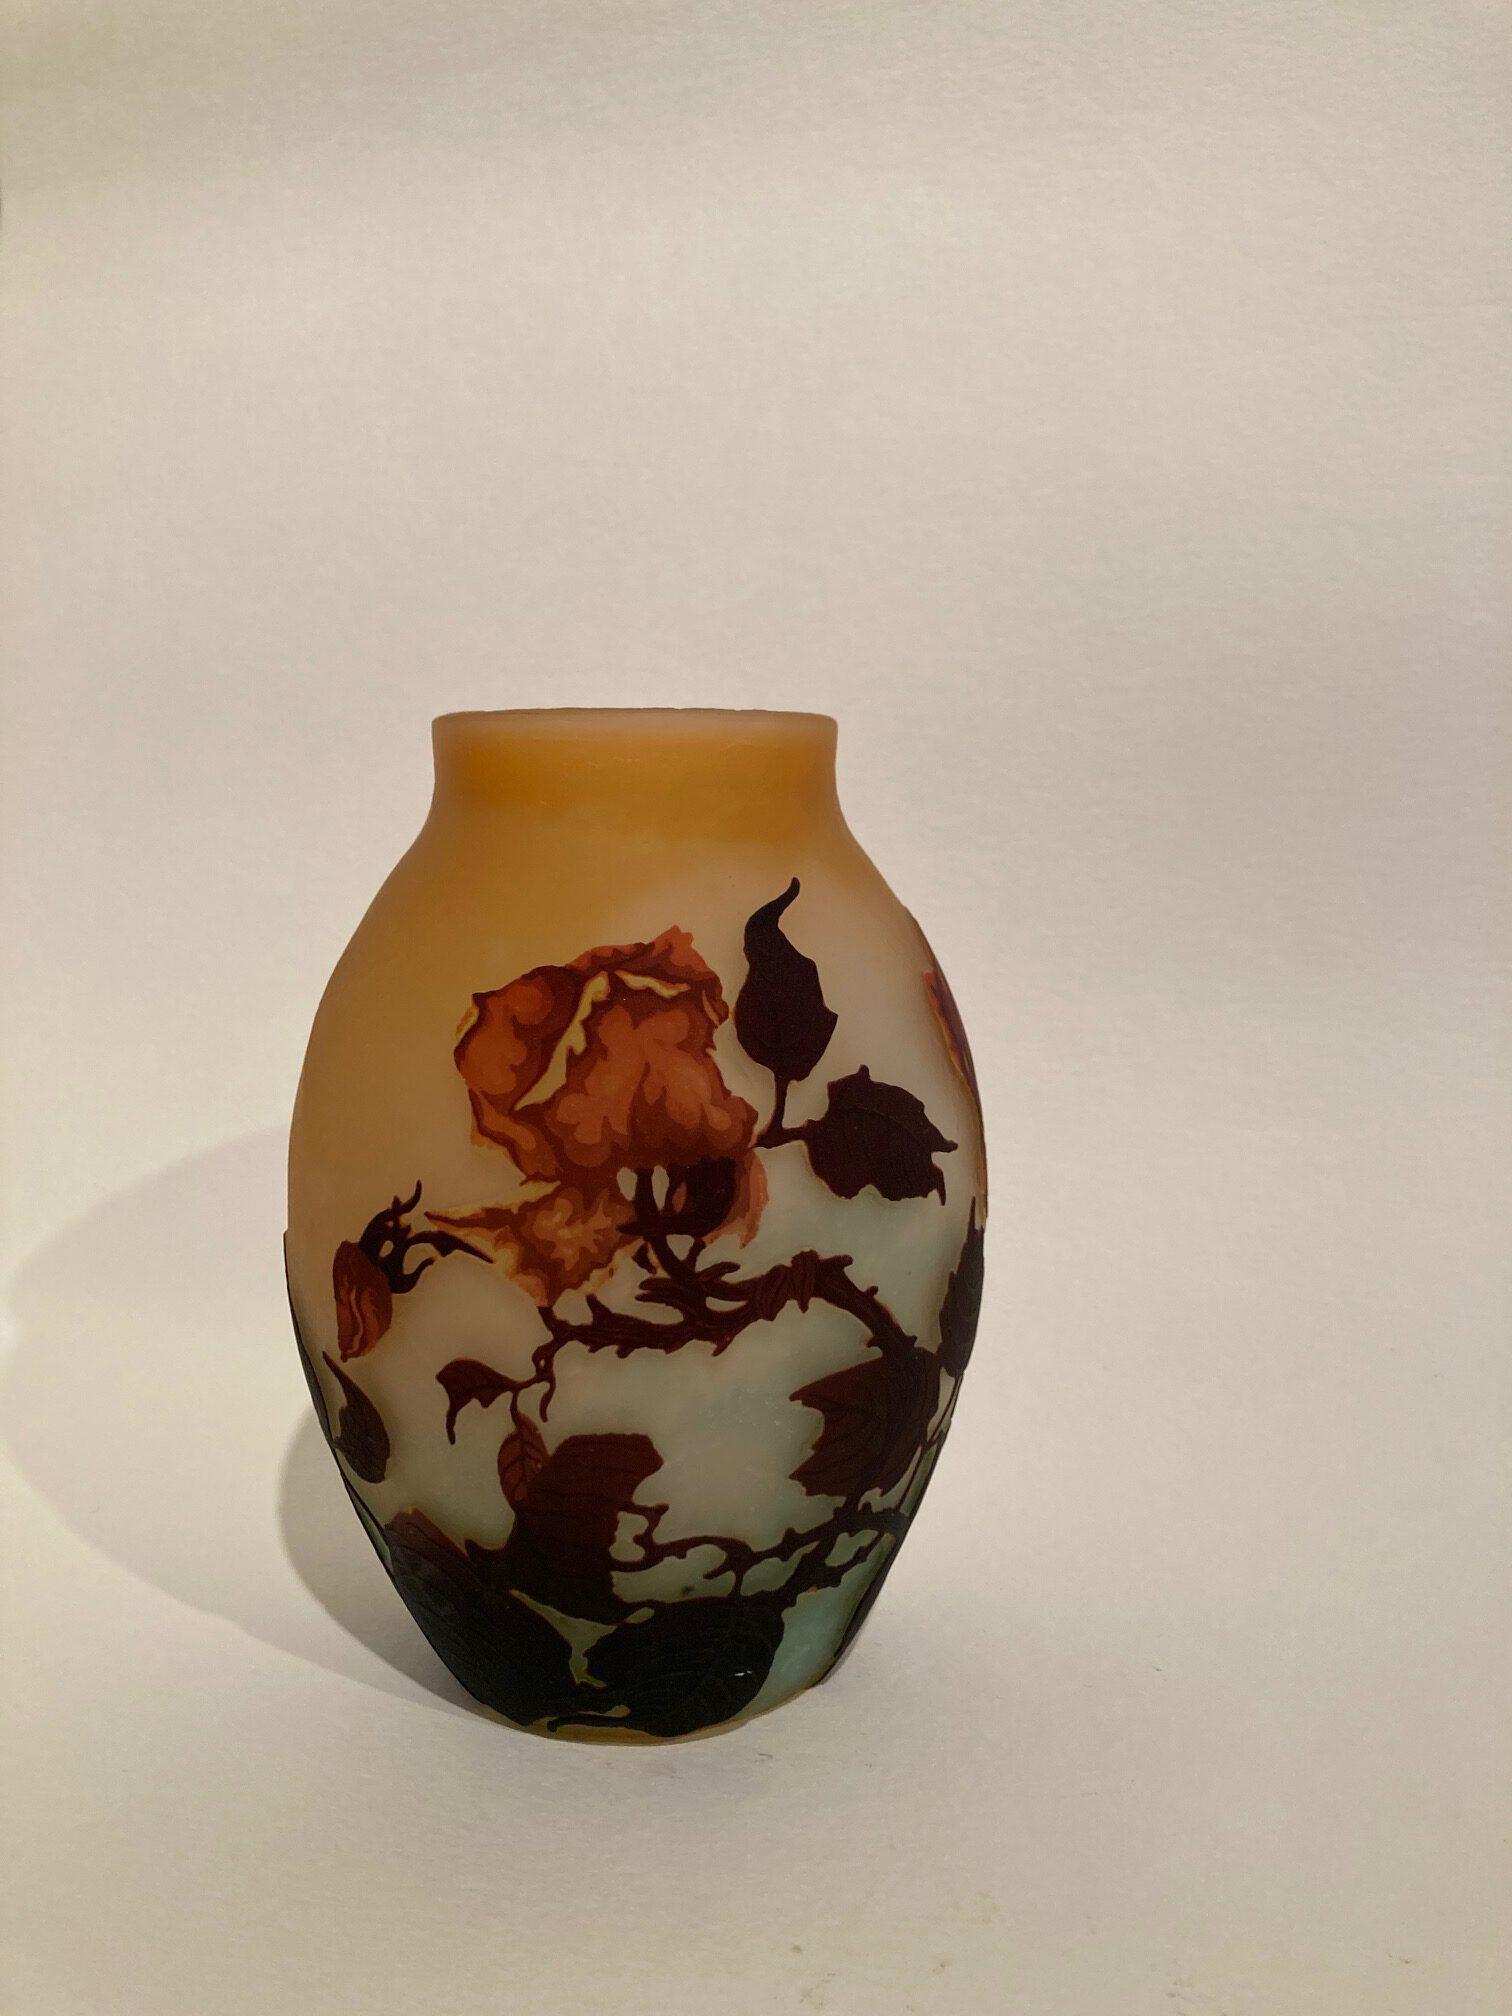 Vase mit Rosen, Muller Frères, Frankreich um 1920